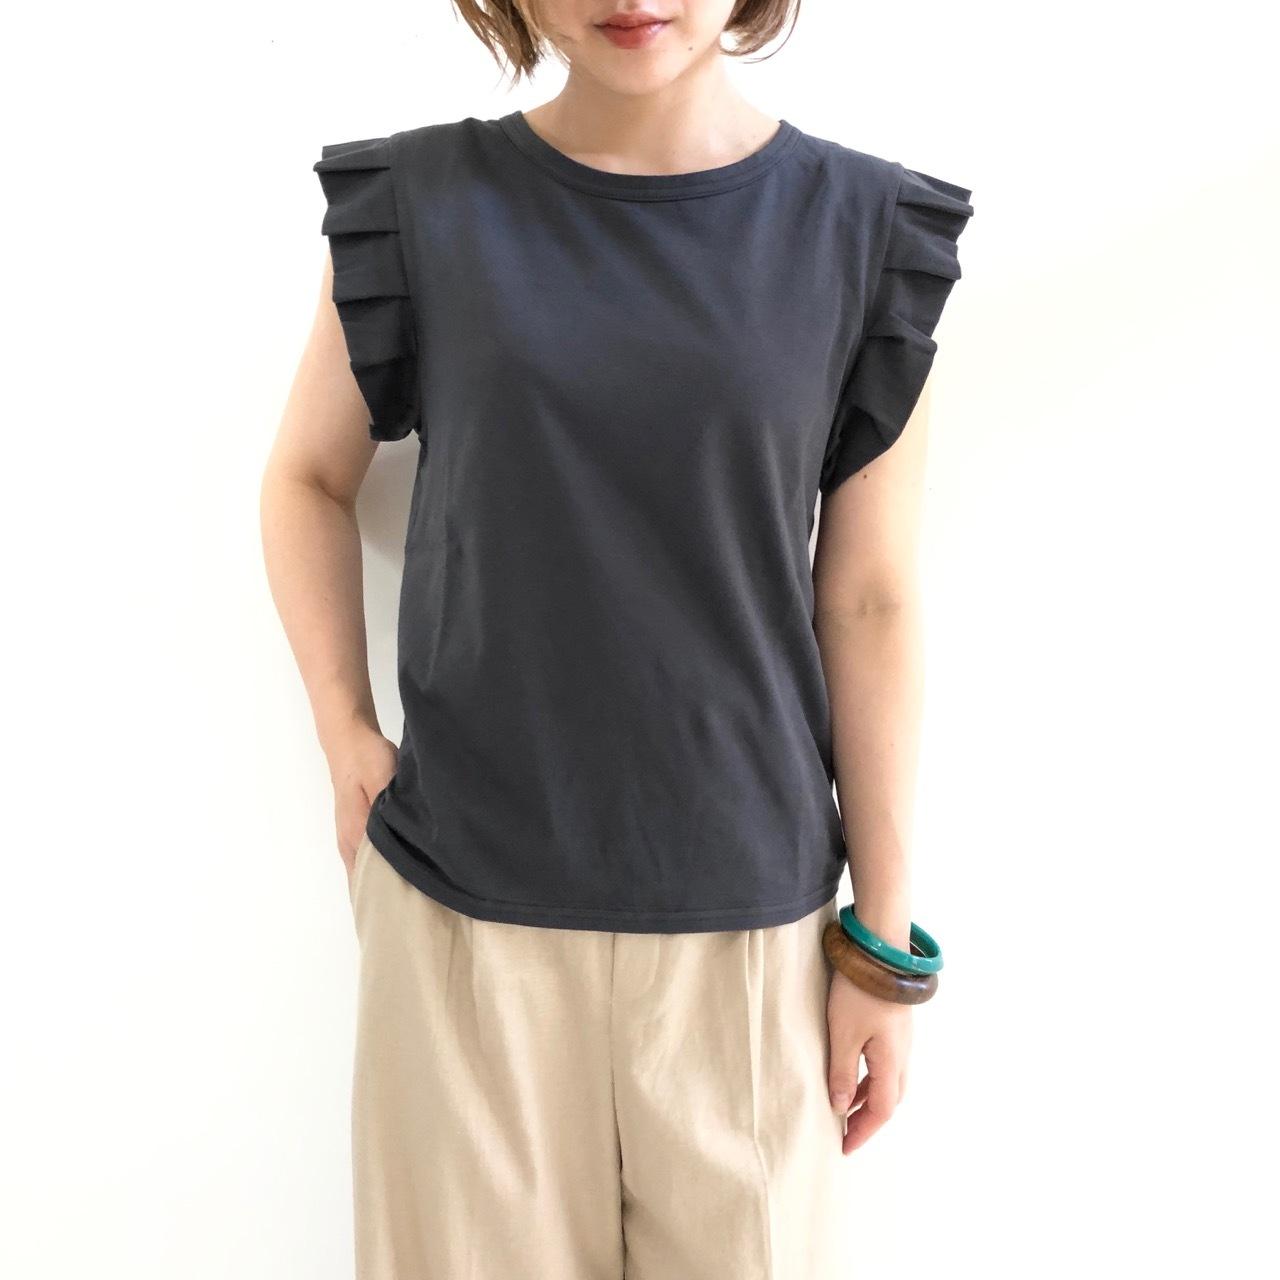 【 siro de labonte 】- R913213A - フリルTeeシャツ